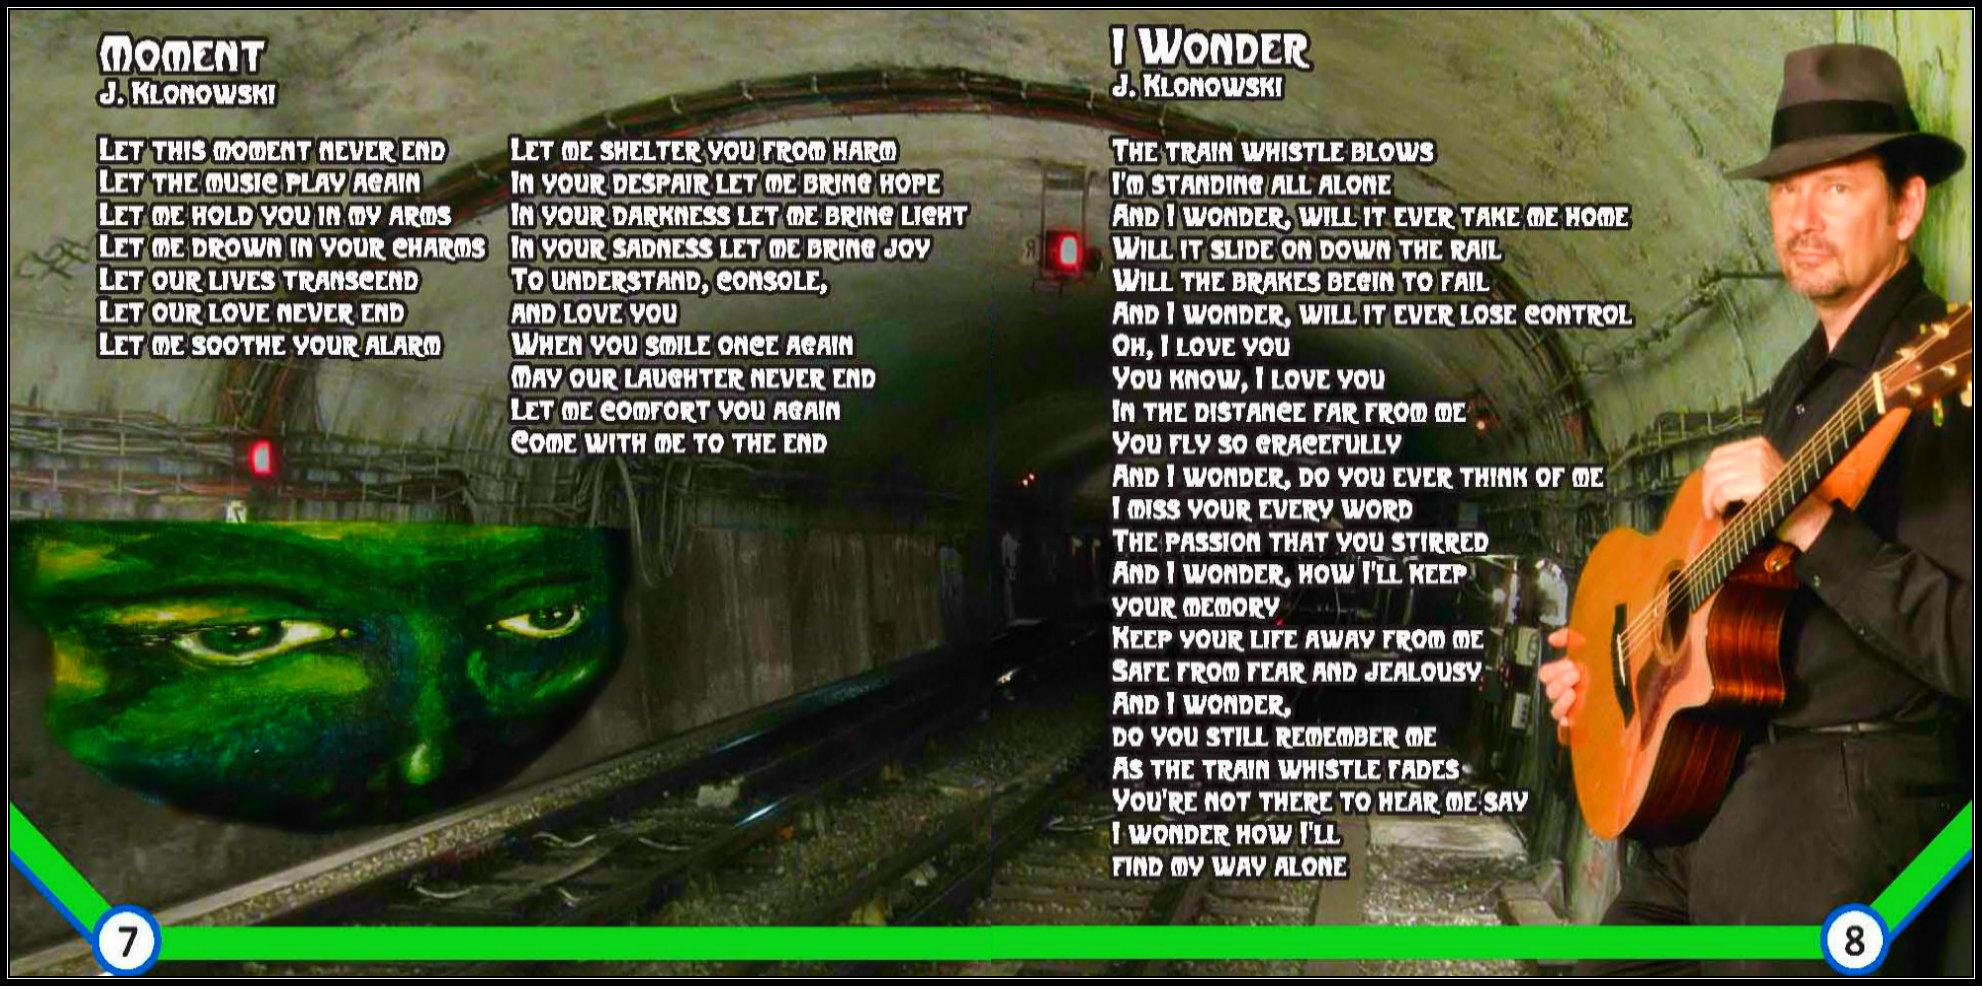 """Moment"" and ""I Wonder"""